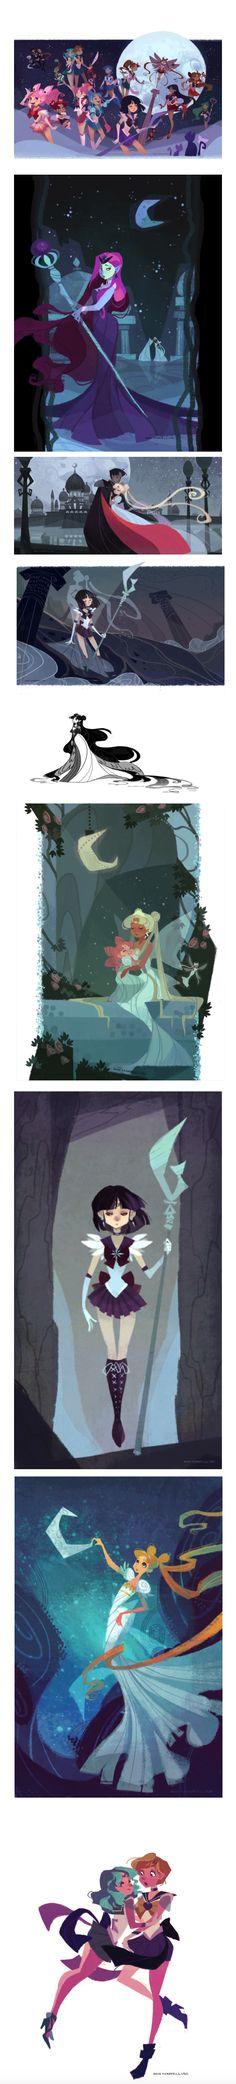 Sailor Moon by Ann Marcellino